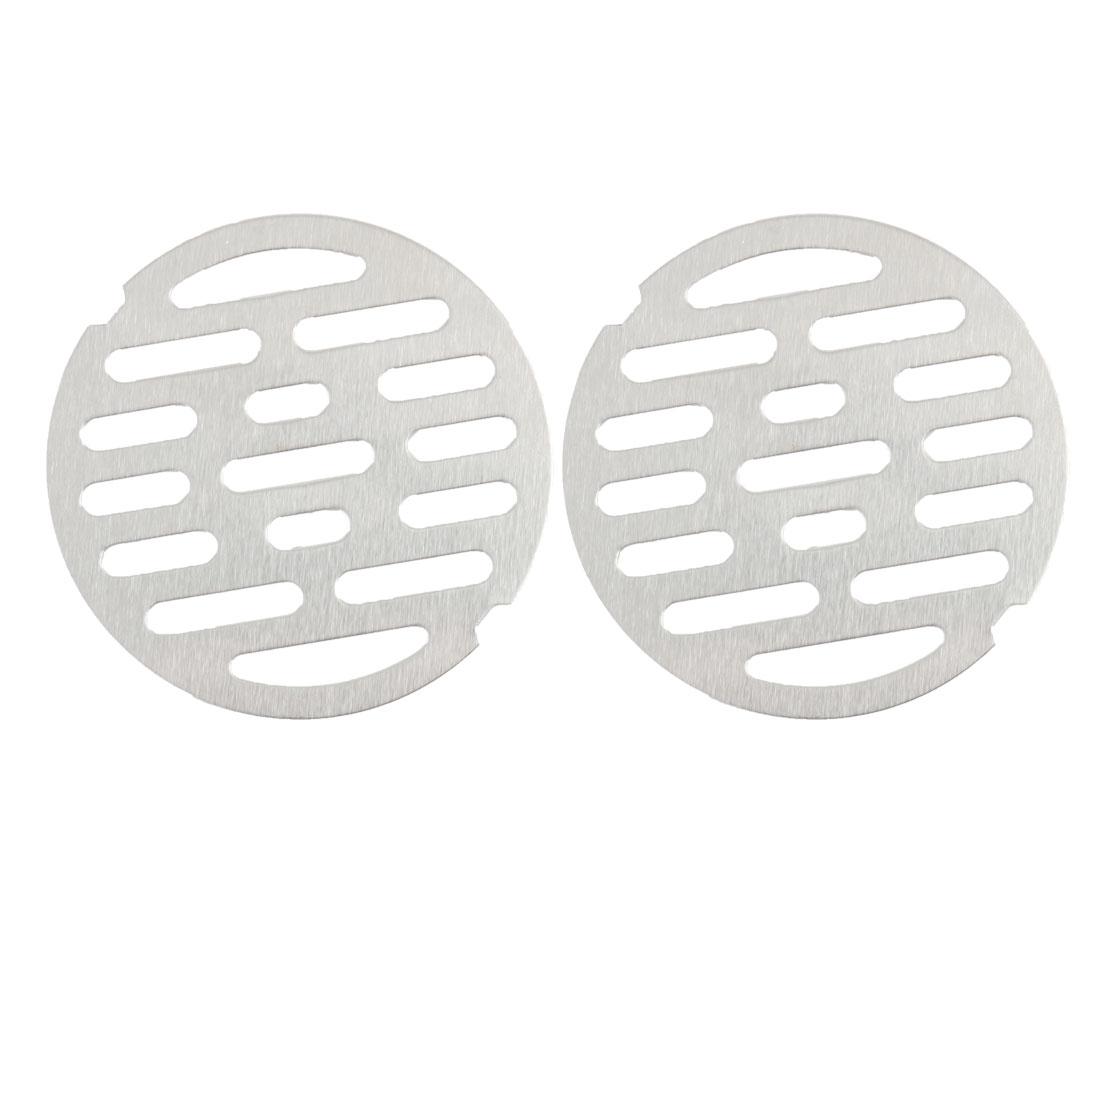 "2pcs 3.4"" Snap-in Floor Drain Cover Hair Catcher Sink Filter Strainer Stopper"